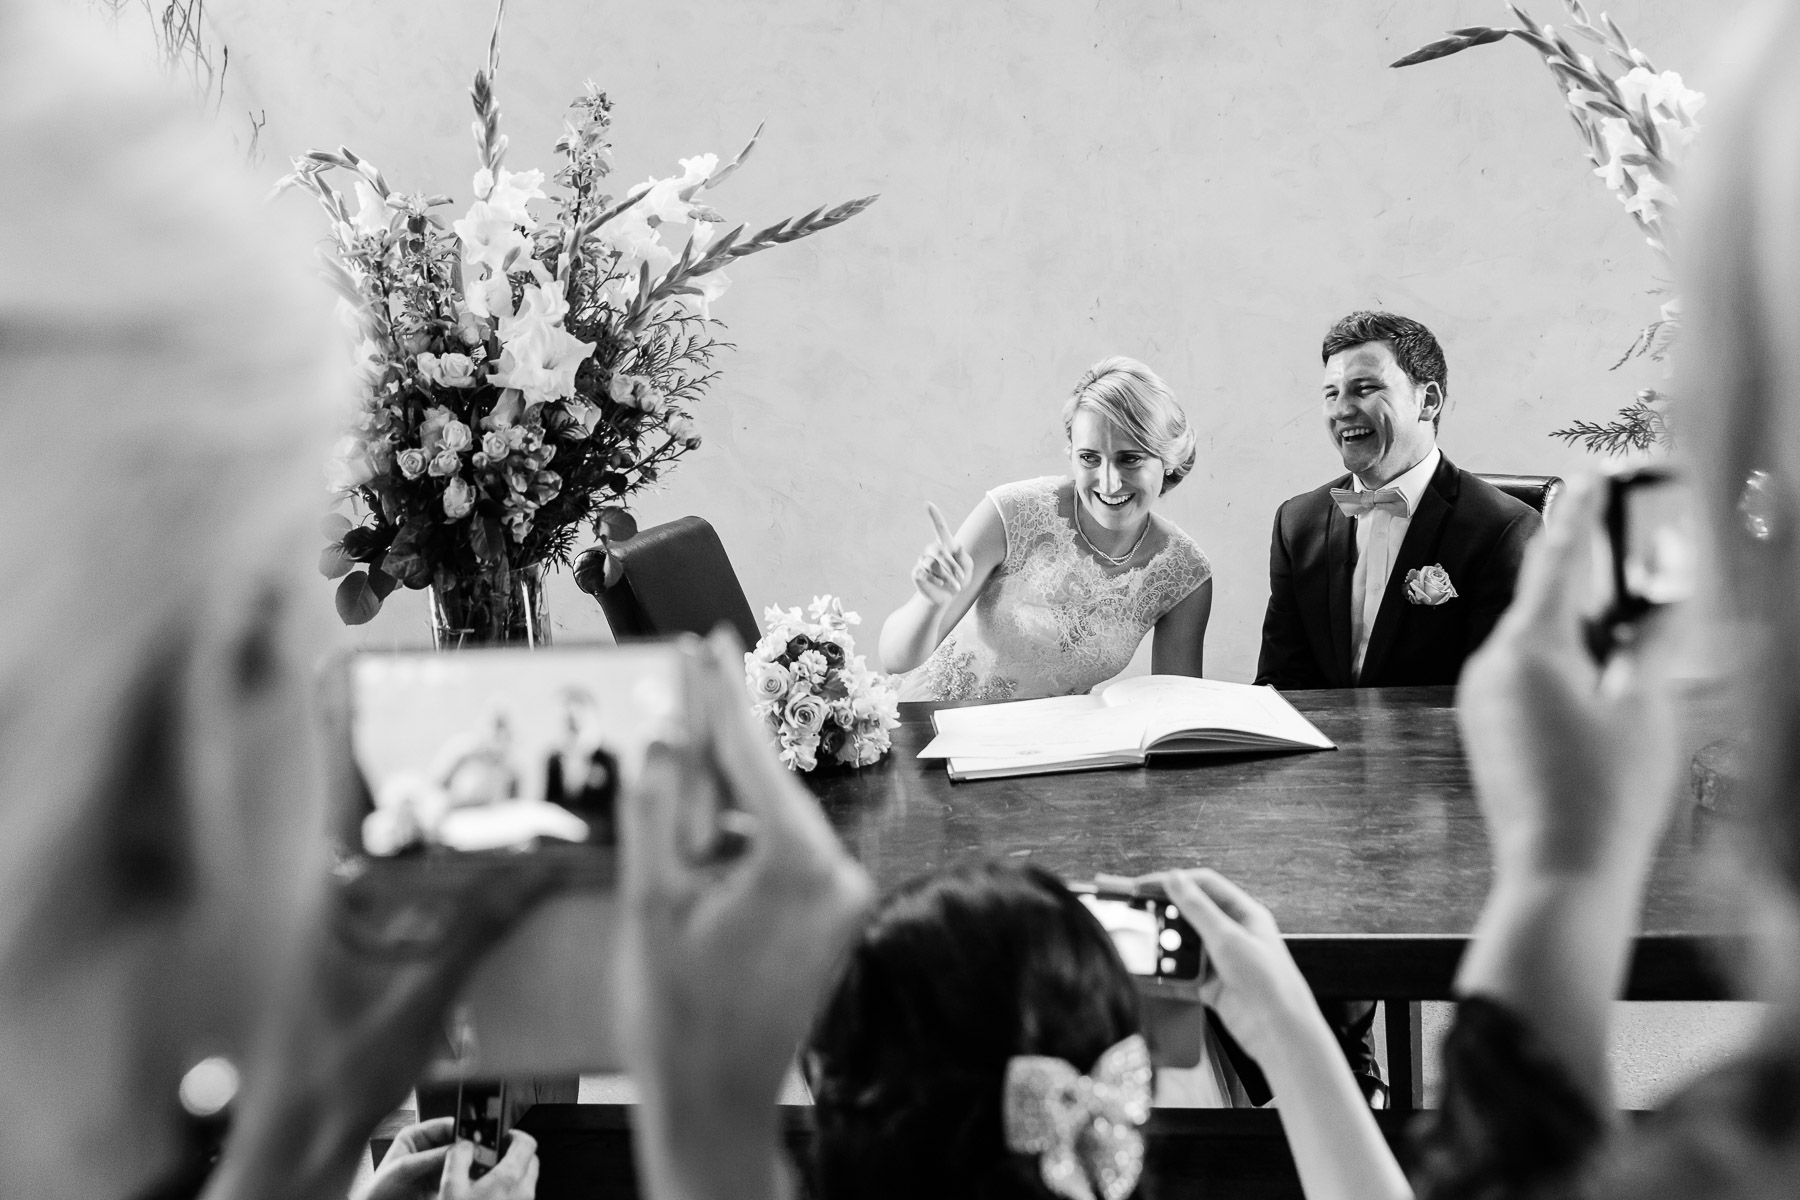 Marnie_and_Charlie_Yarra_Valley_Wedding_Blog-53.jpg